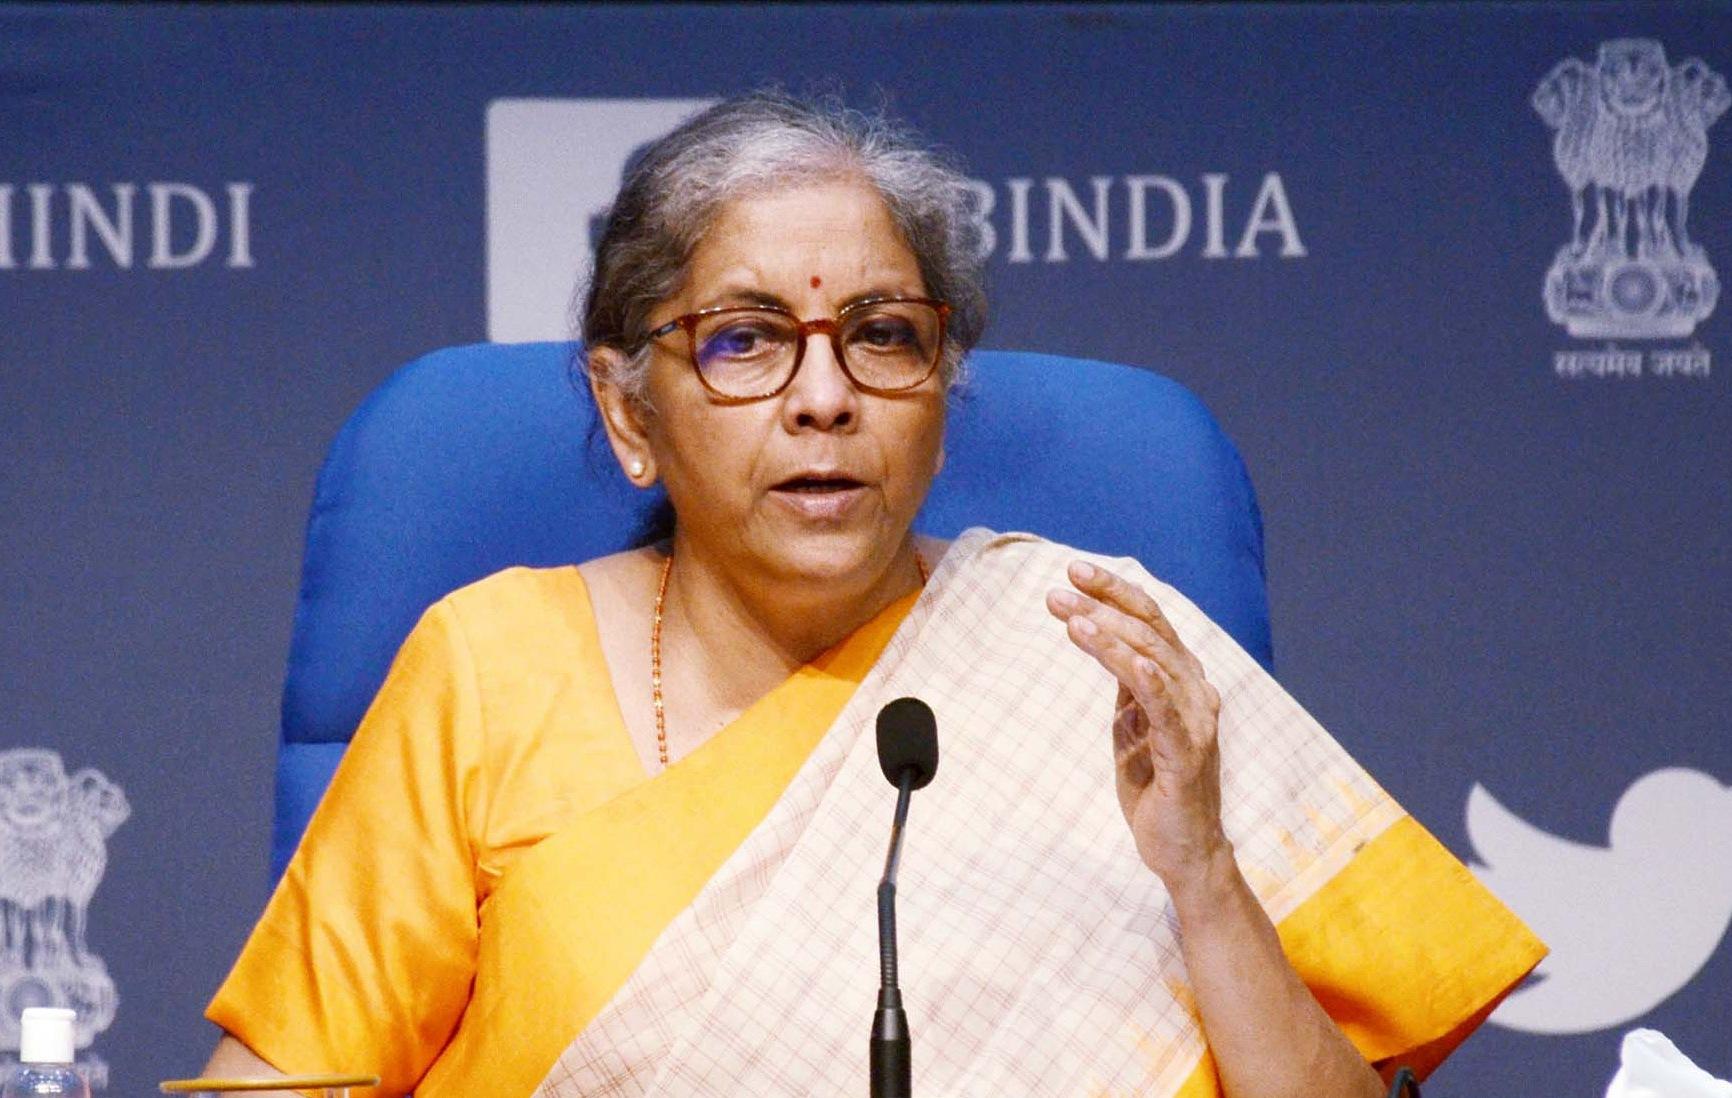 India's Finance Minster